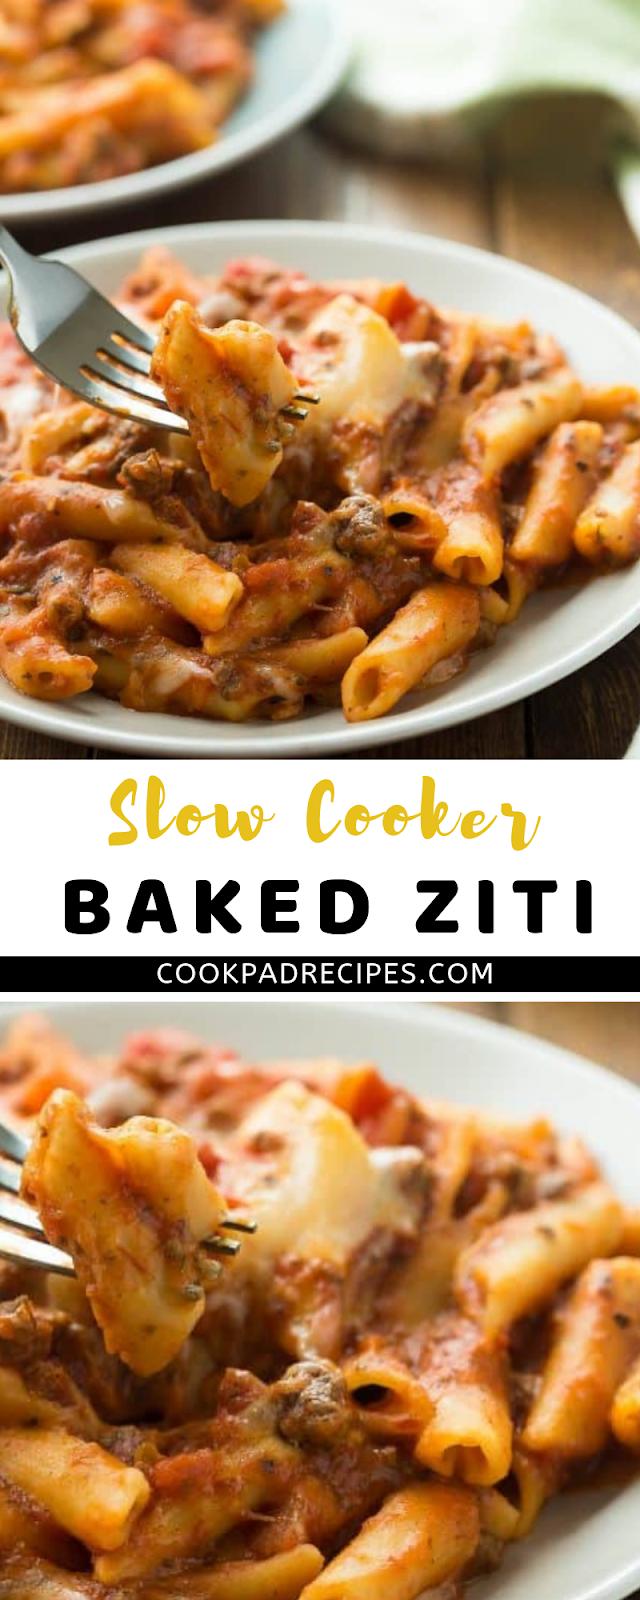 Slоw Cooker Baked Ziti